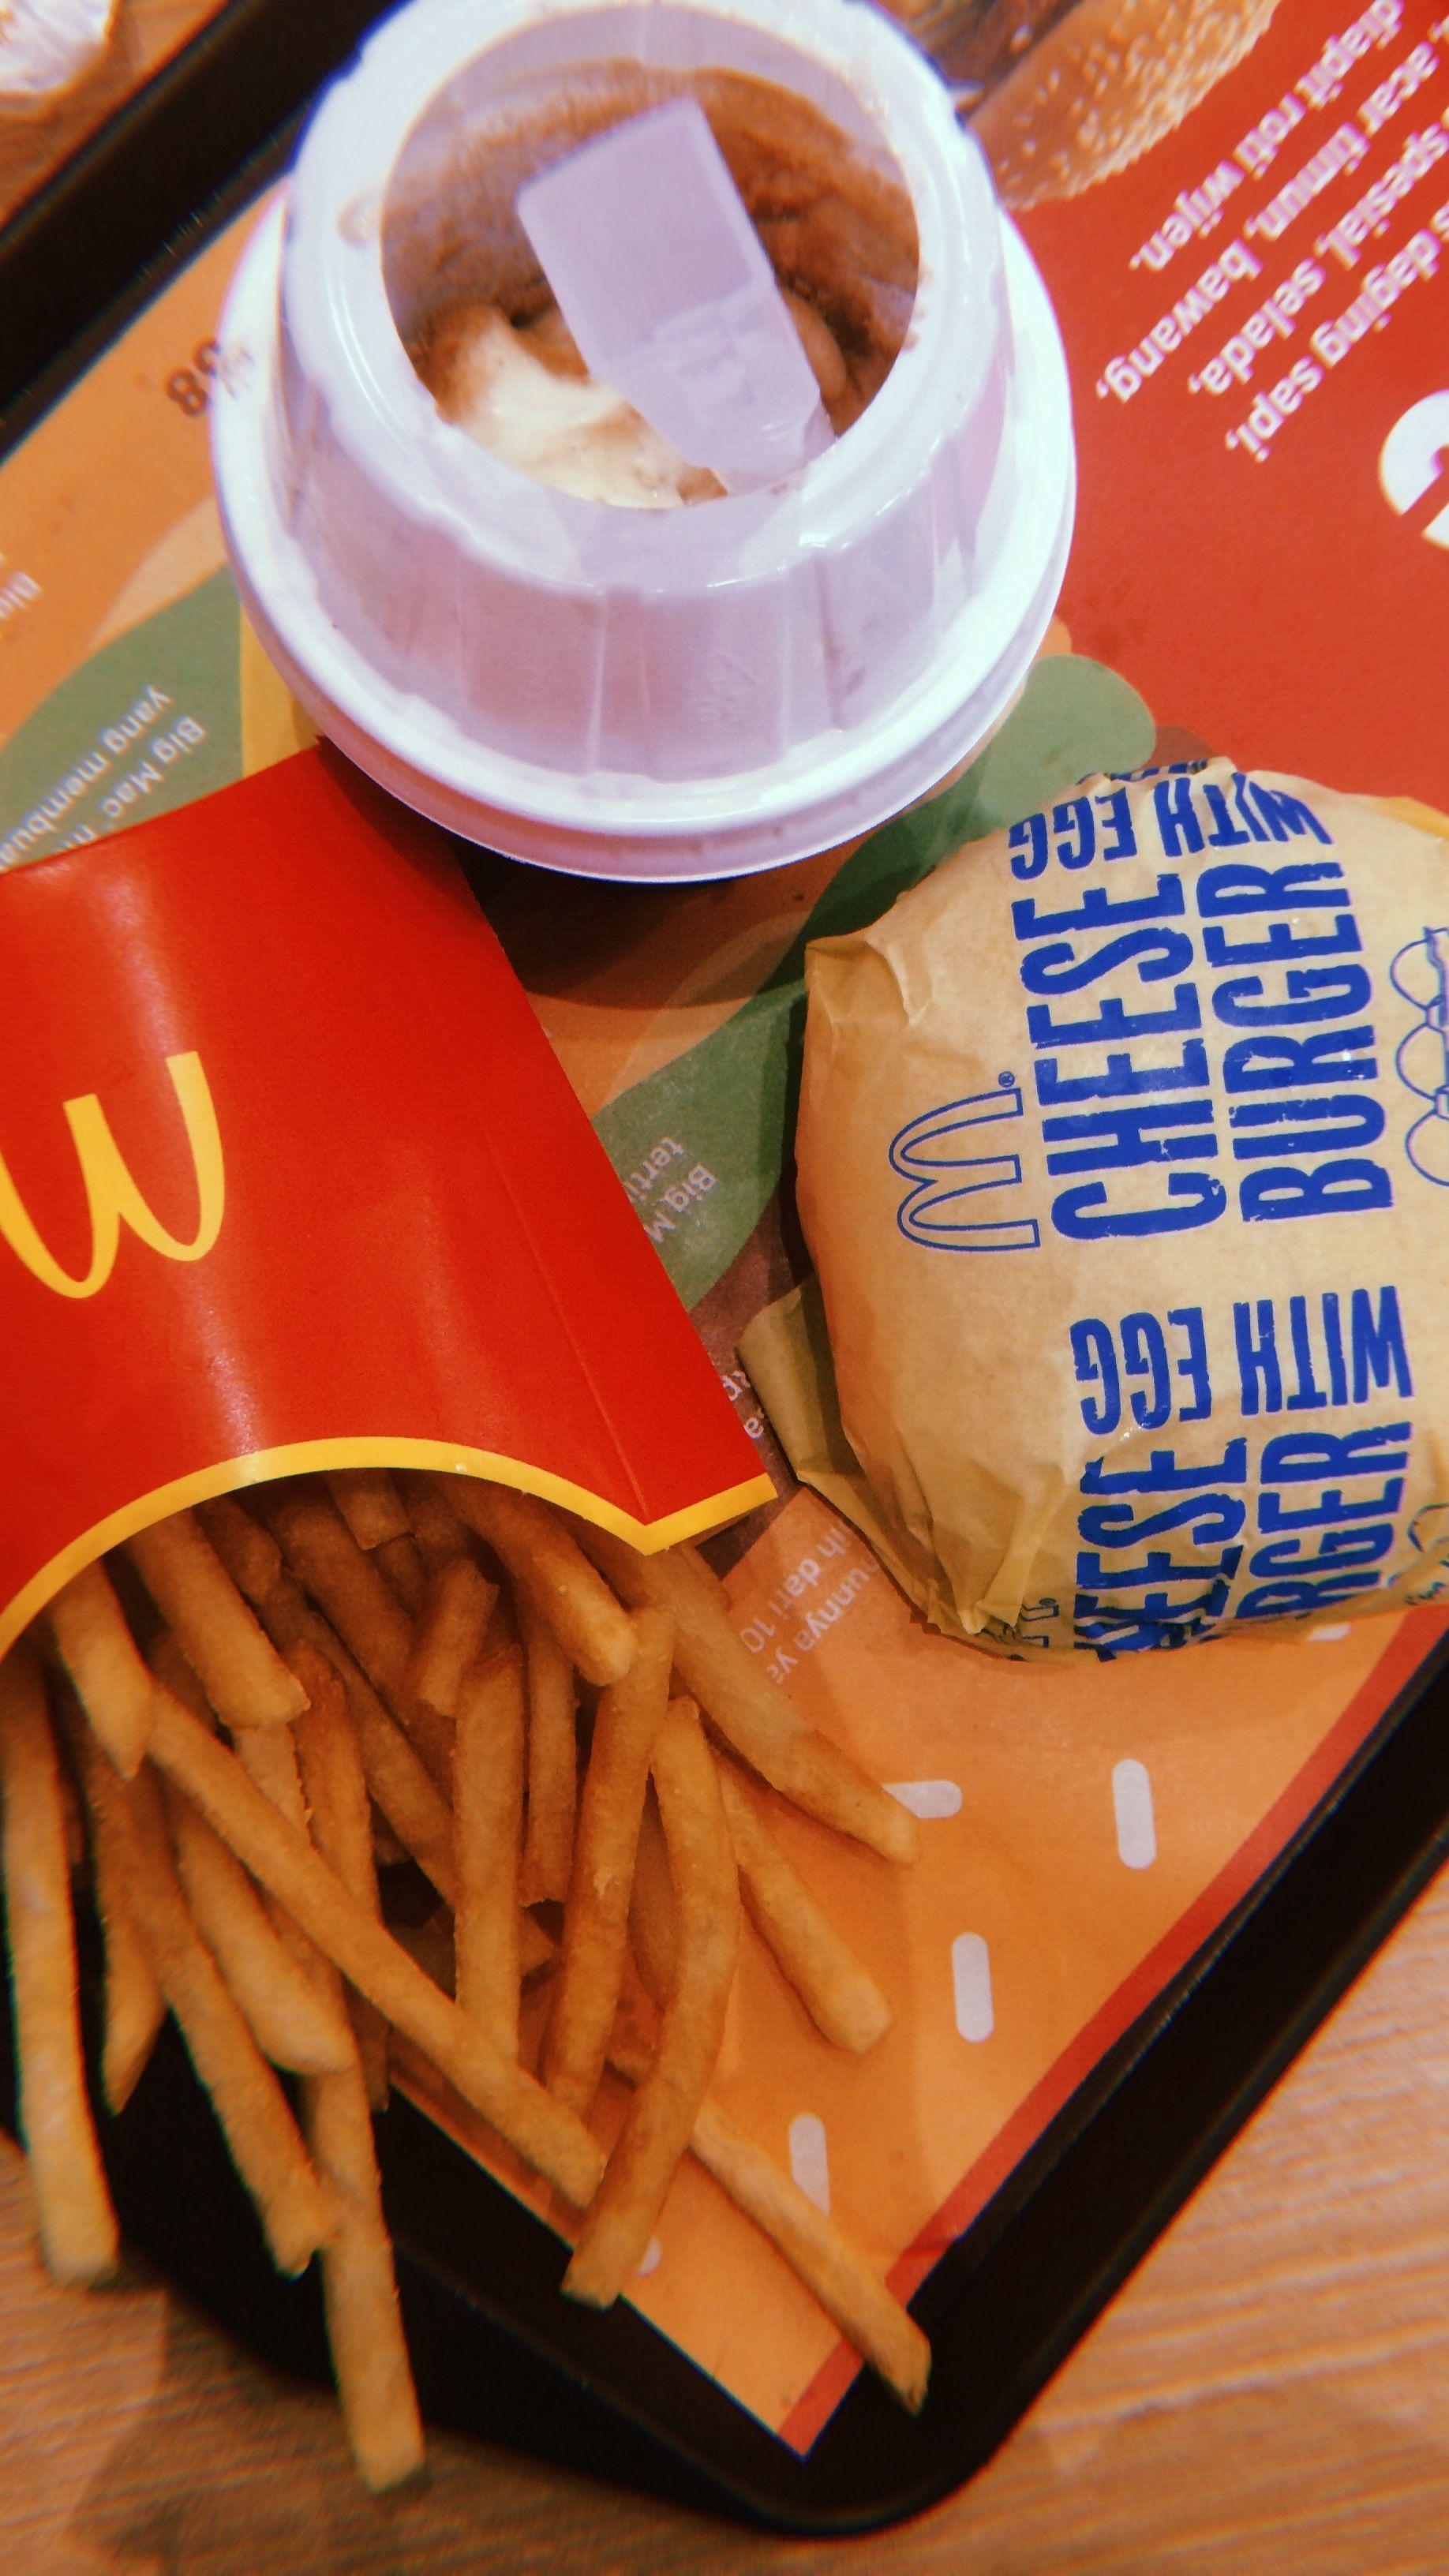 Mcdonalds Makanan Dan Minuman Makanan Resep Makanan